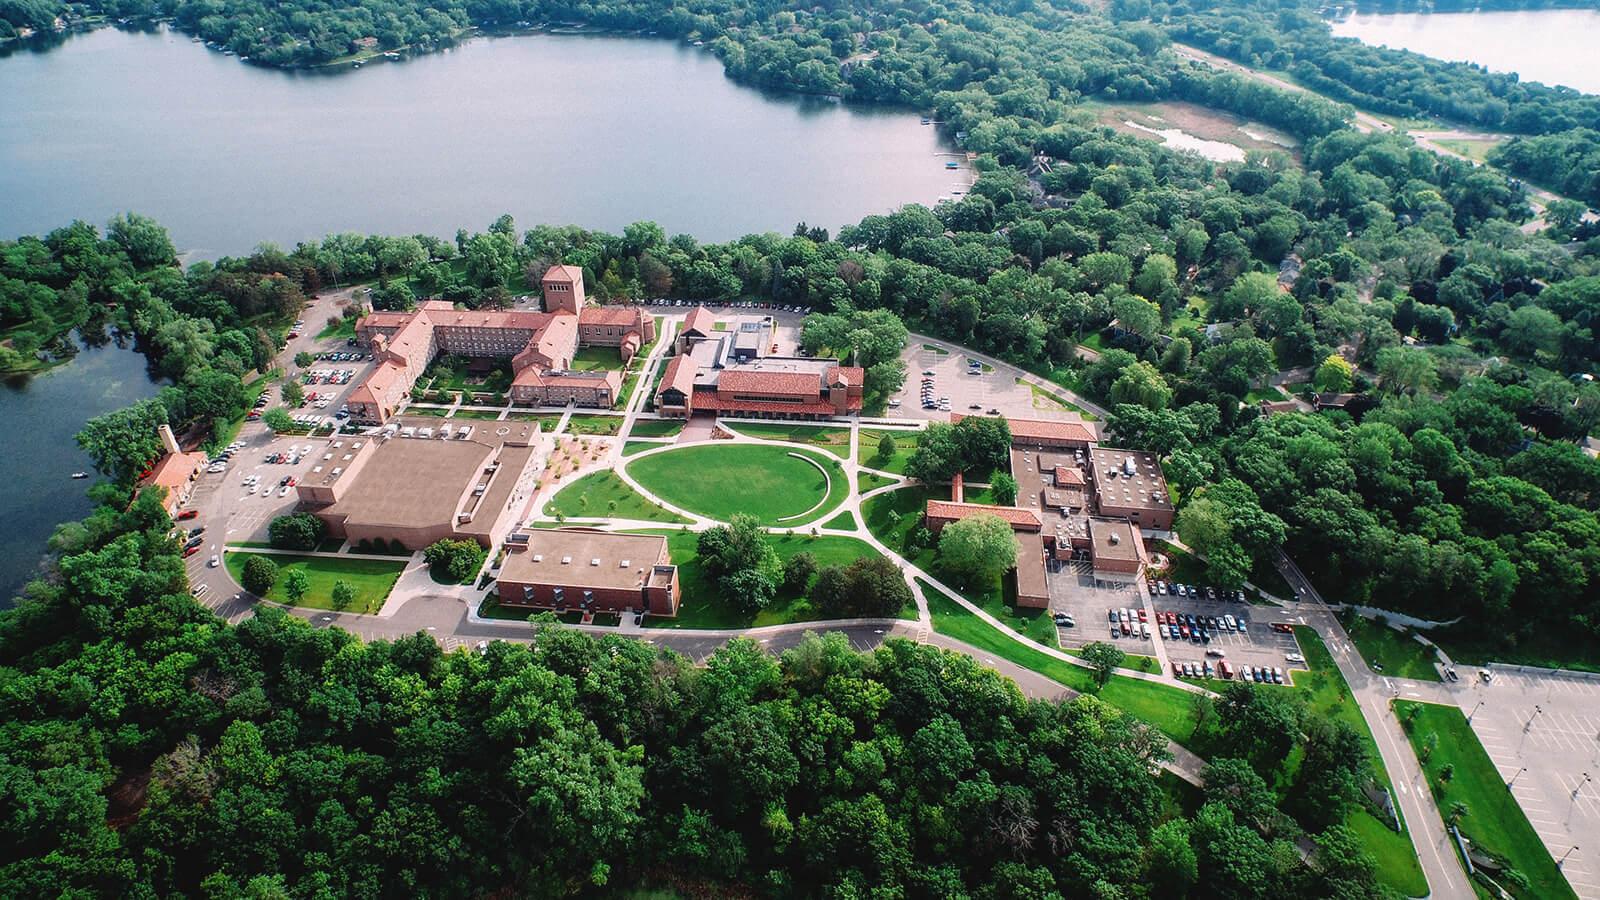 University Of Northwestern St Paul Tuition >> University Of Northwestern St Paul Cappex